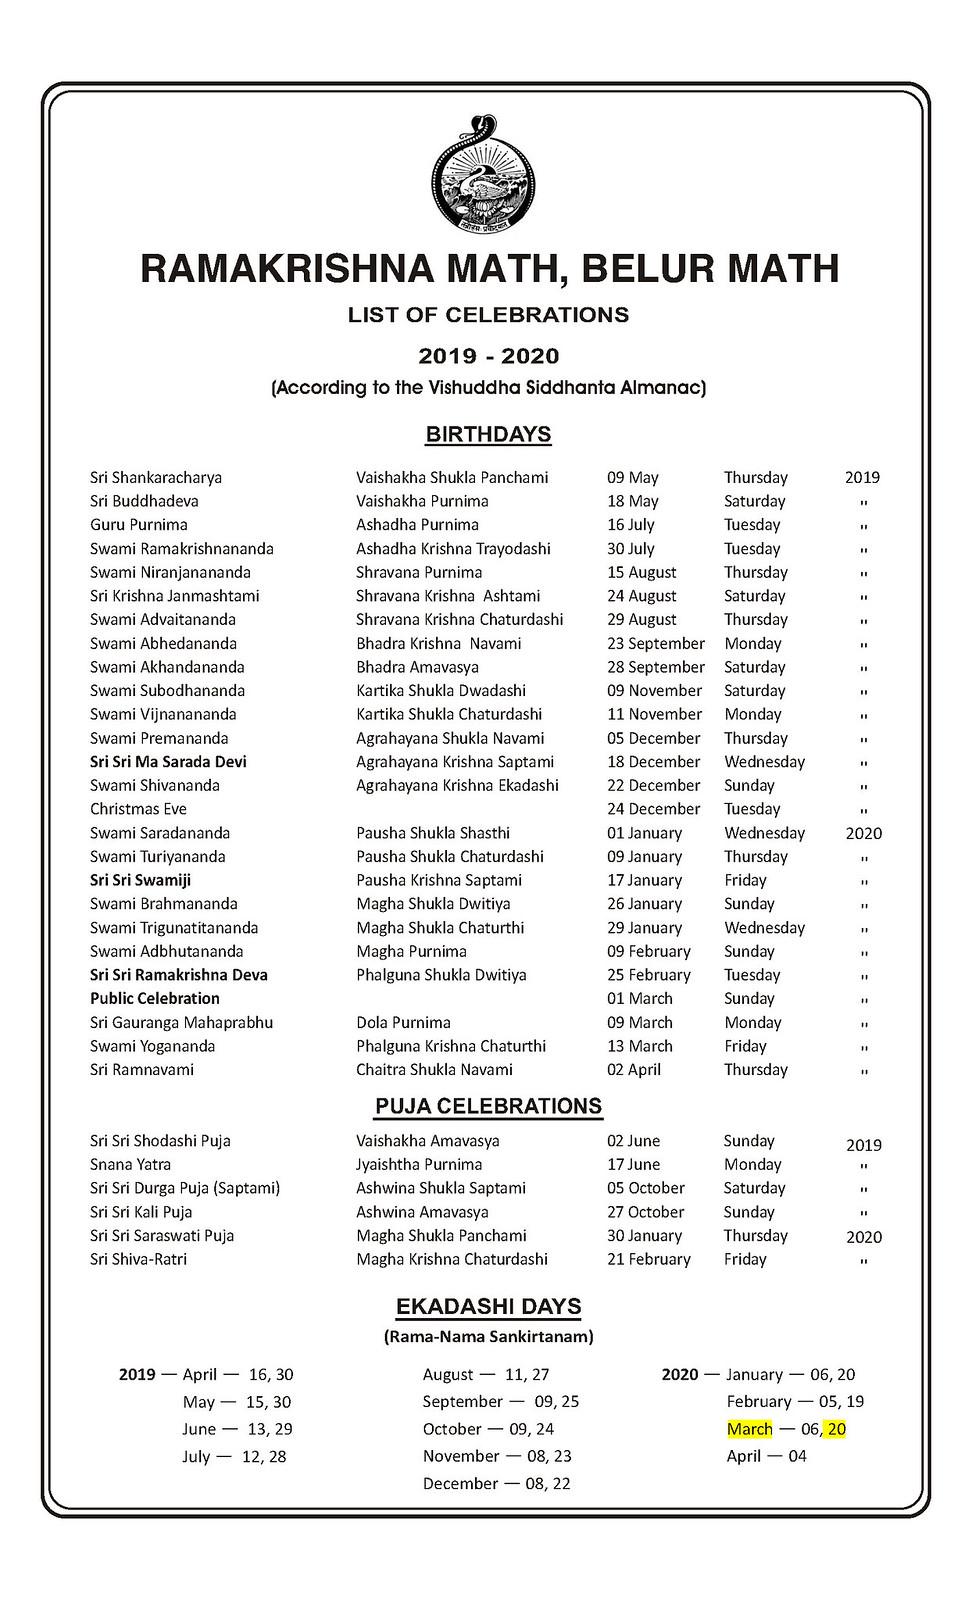 Belur Math Festival Calendar (2019-20) - Belur Math - Ramakrishna for Calender Of October 2019 According To Tithi